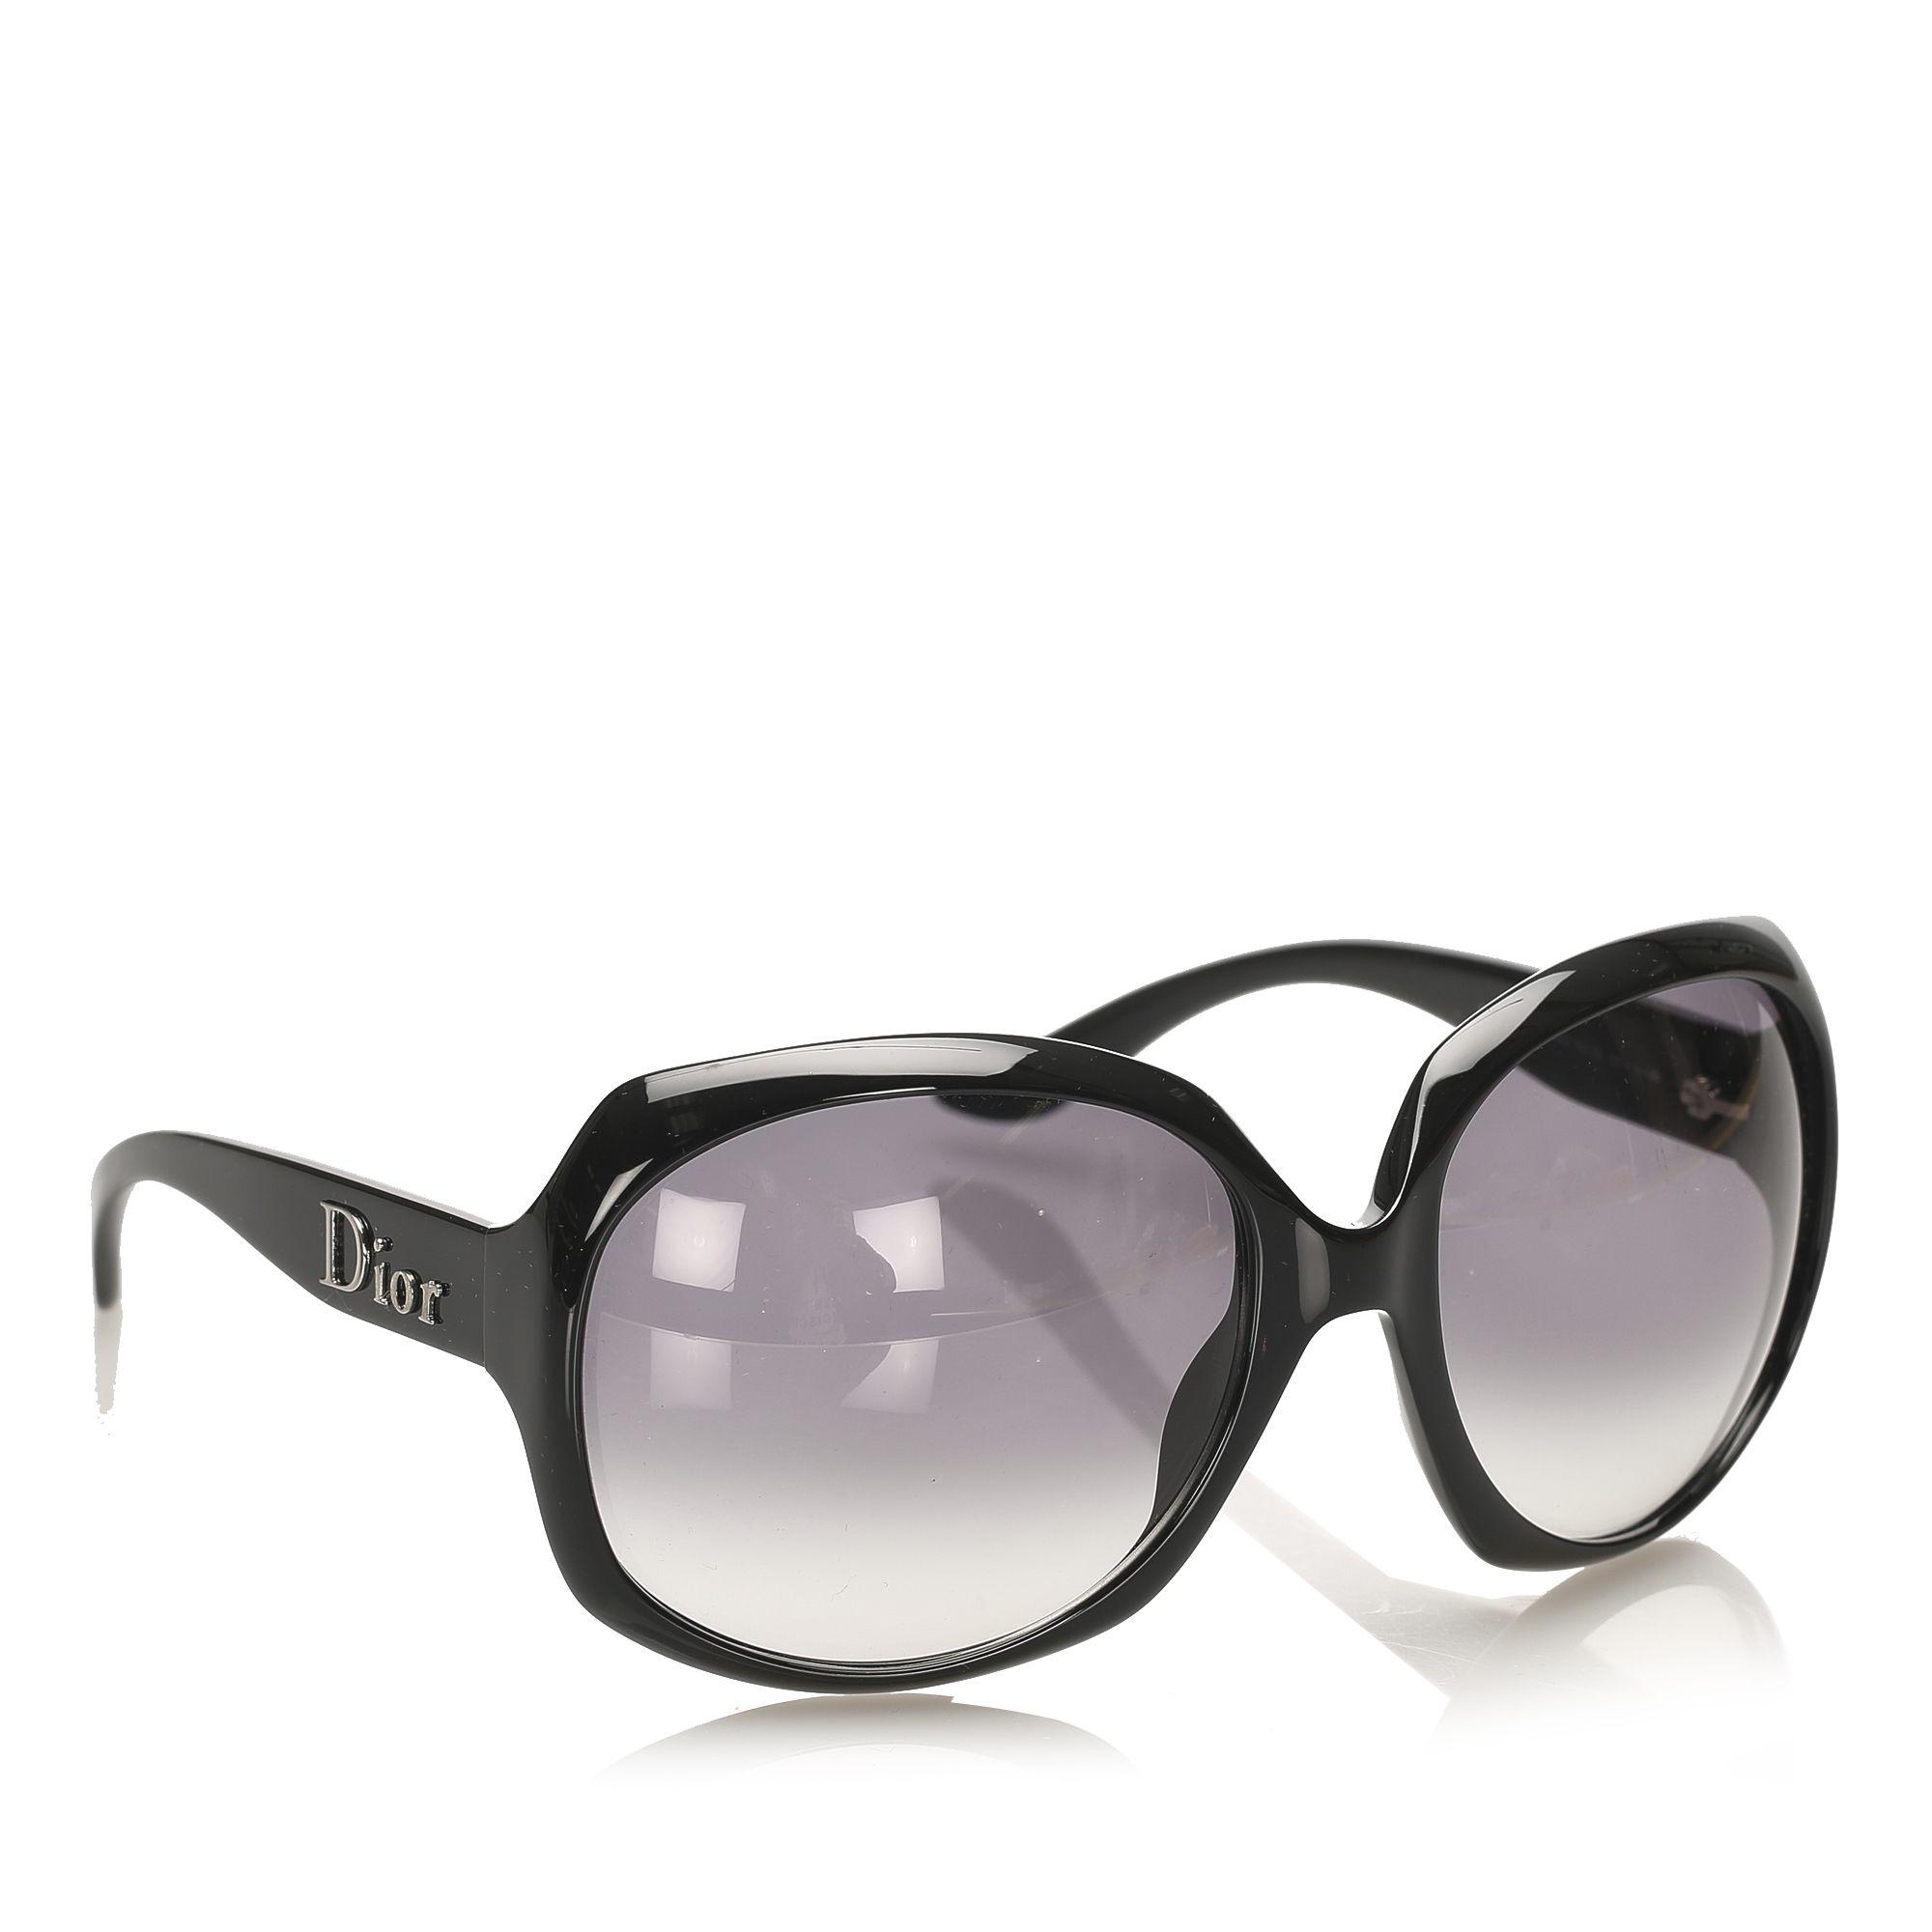 Vintage Dior Round Tinted Sunglasses Black